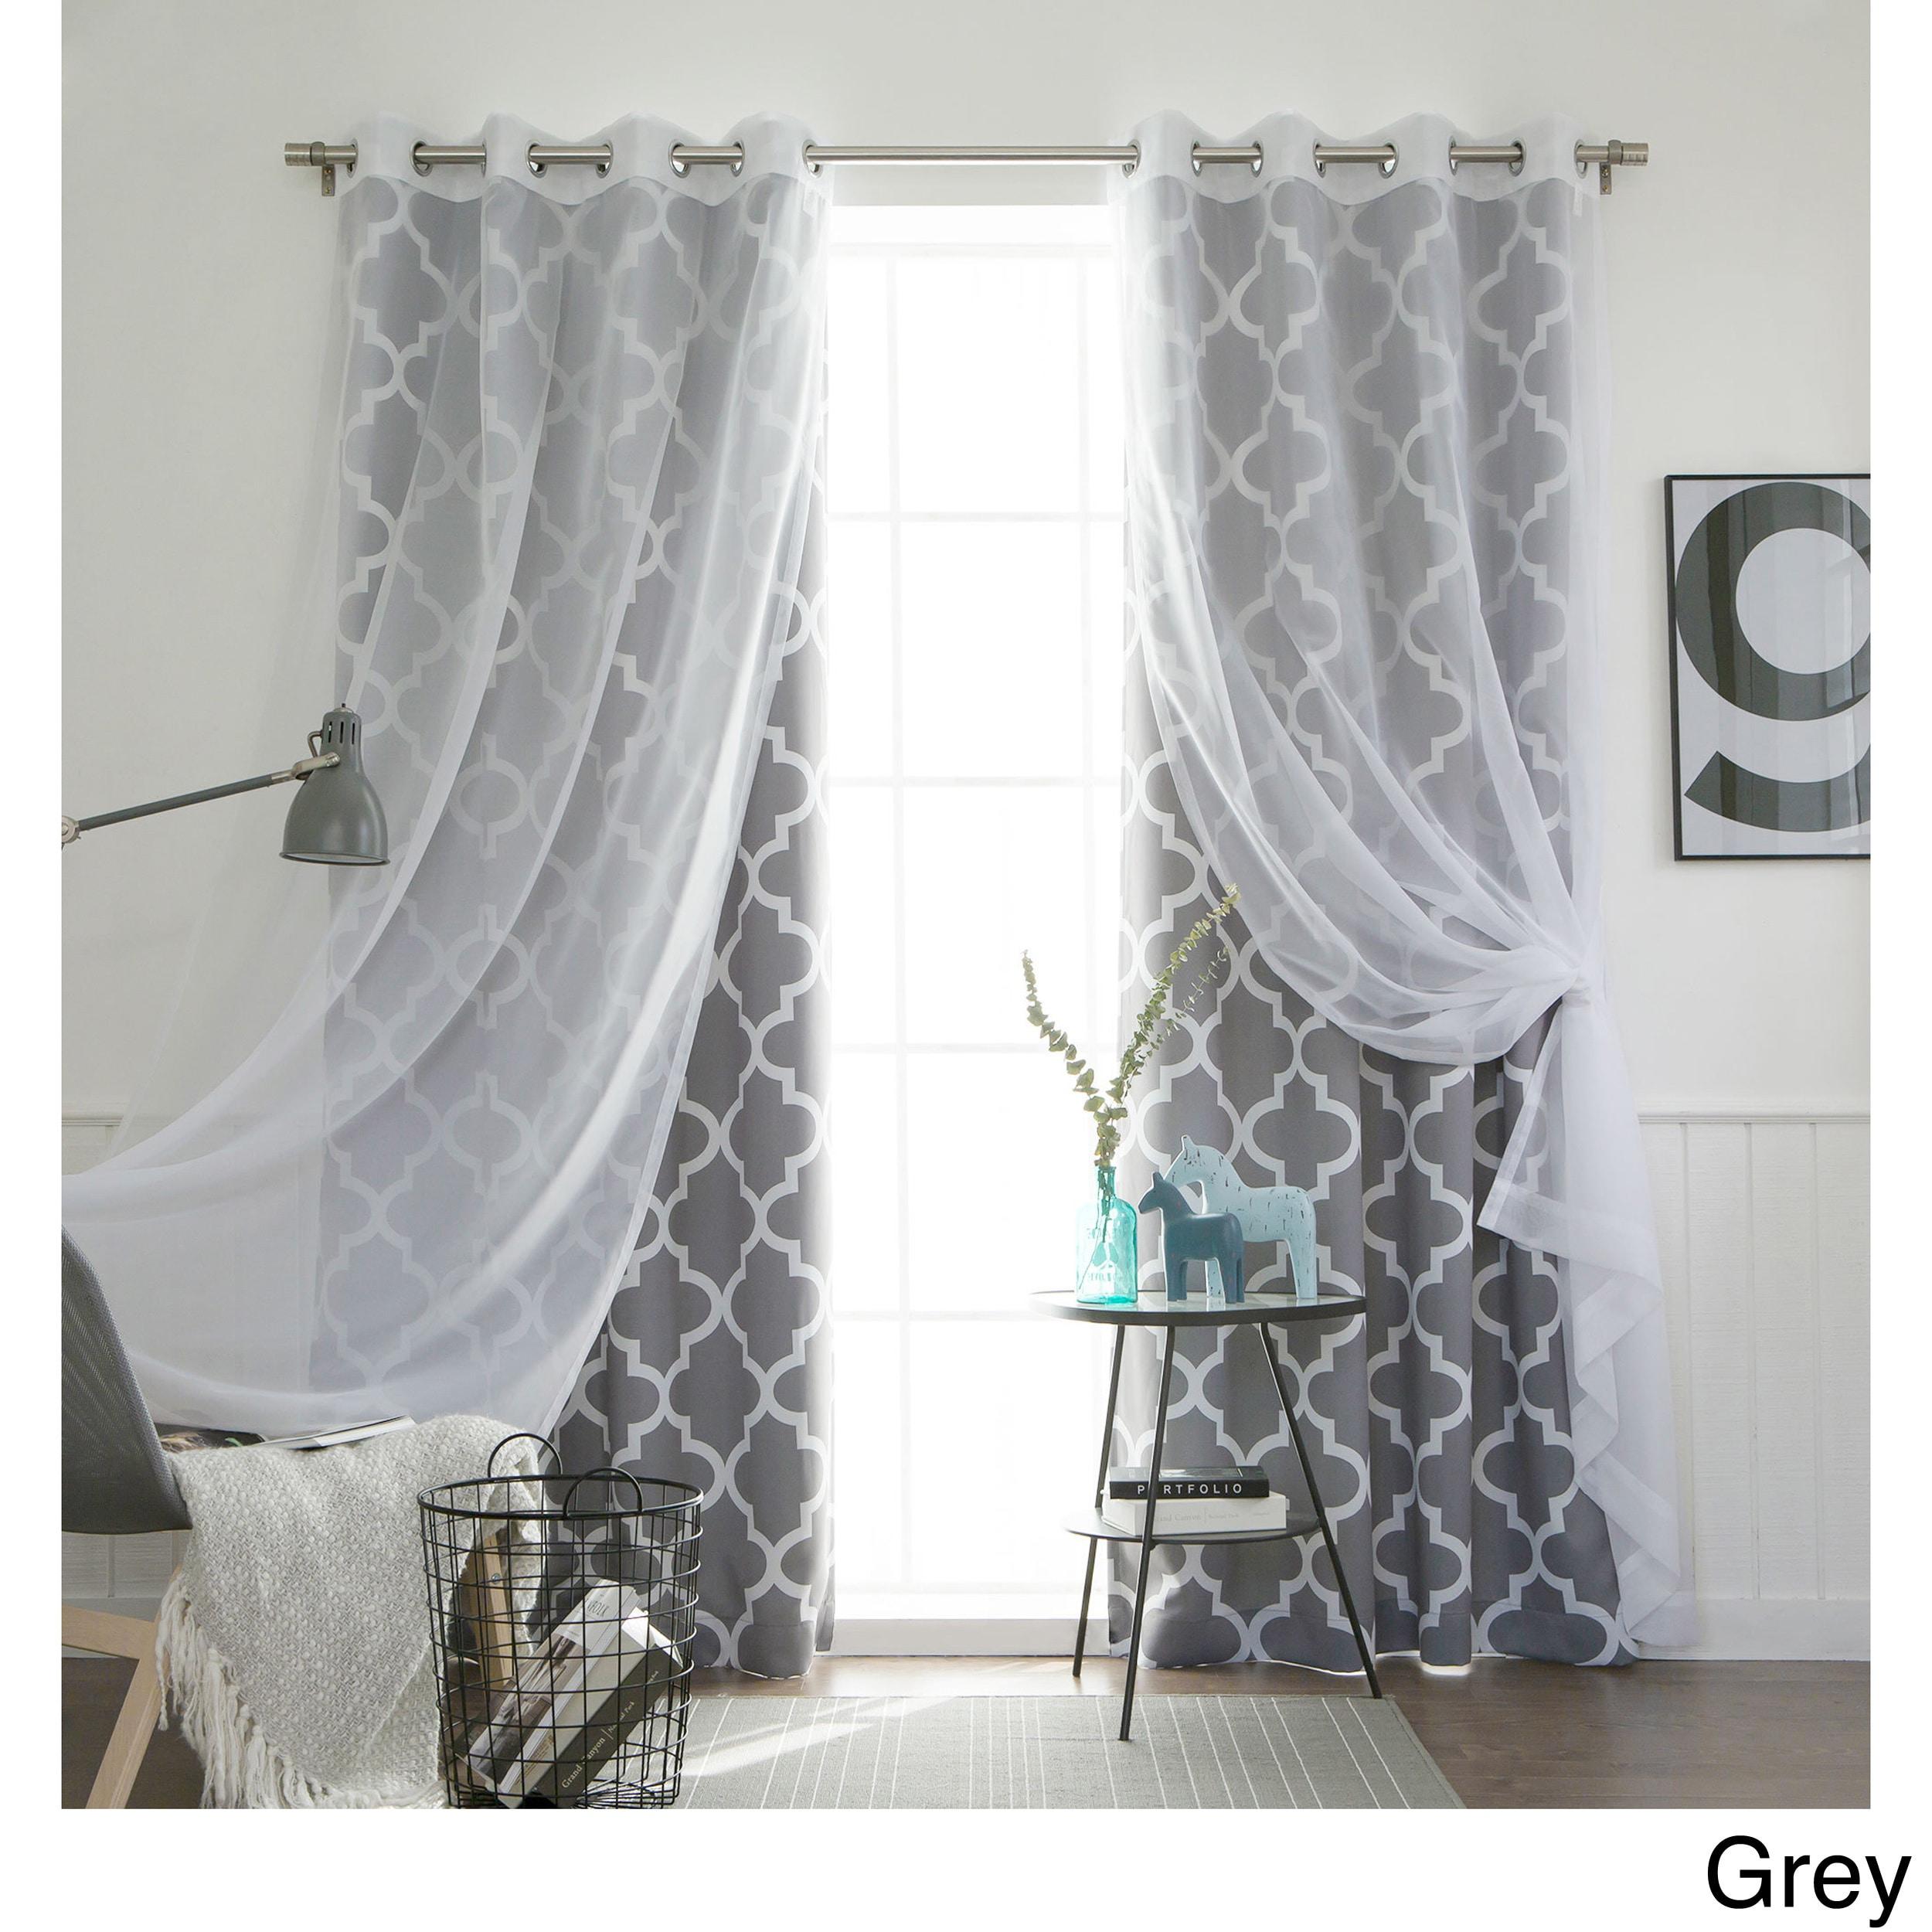 floral curtain sheer rod lavender kiki itm pocket purple voile crushed panel no x print curtains